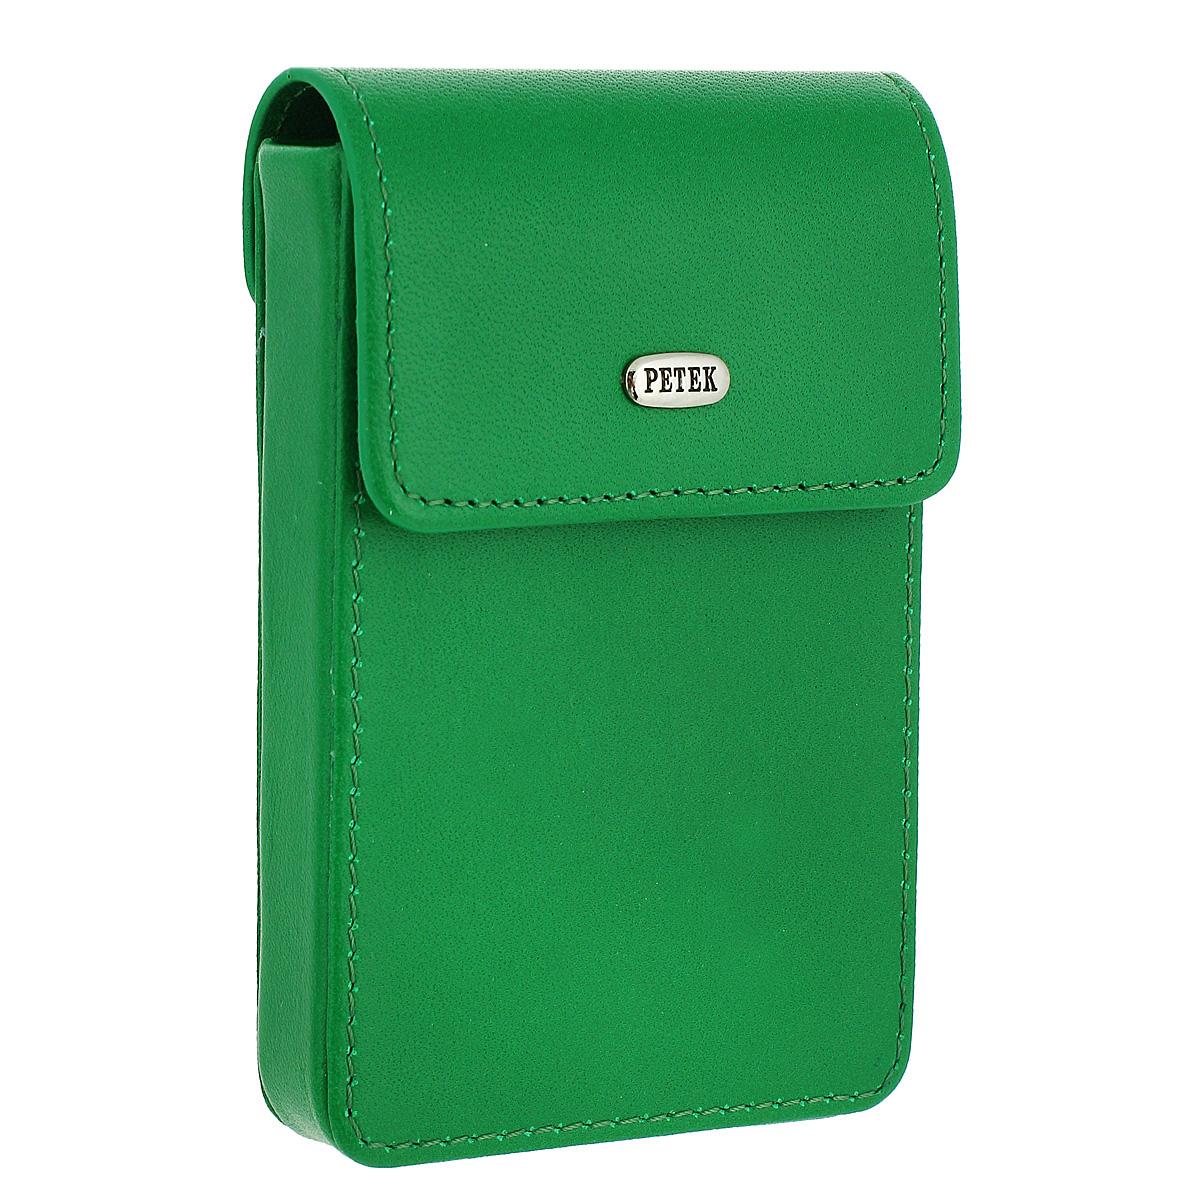 Футляр для визиток Petek, цвет: зеленый.617/1.46D.91 Mint LeafA52_108Характеристики:Материал: натуральная кожа, текстиль, металл. Цвет: зеленый. Размер футляра: 10 см х 6 см х 2,5 см